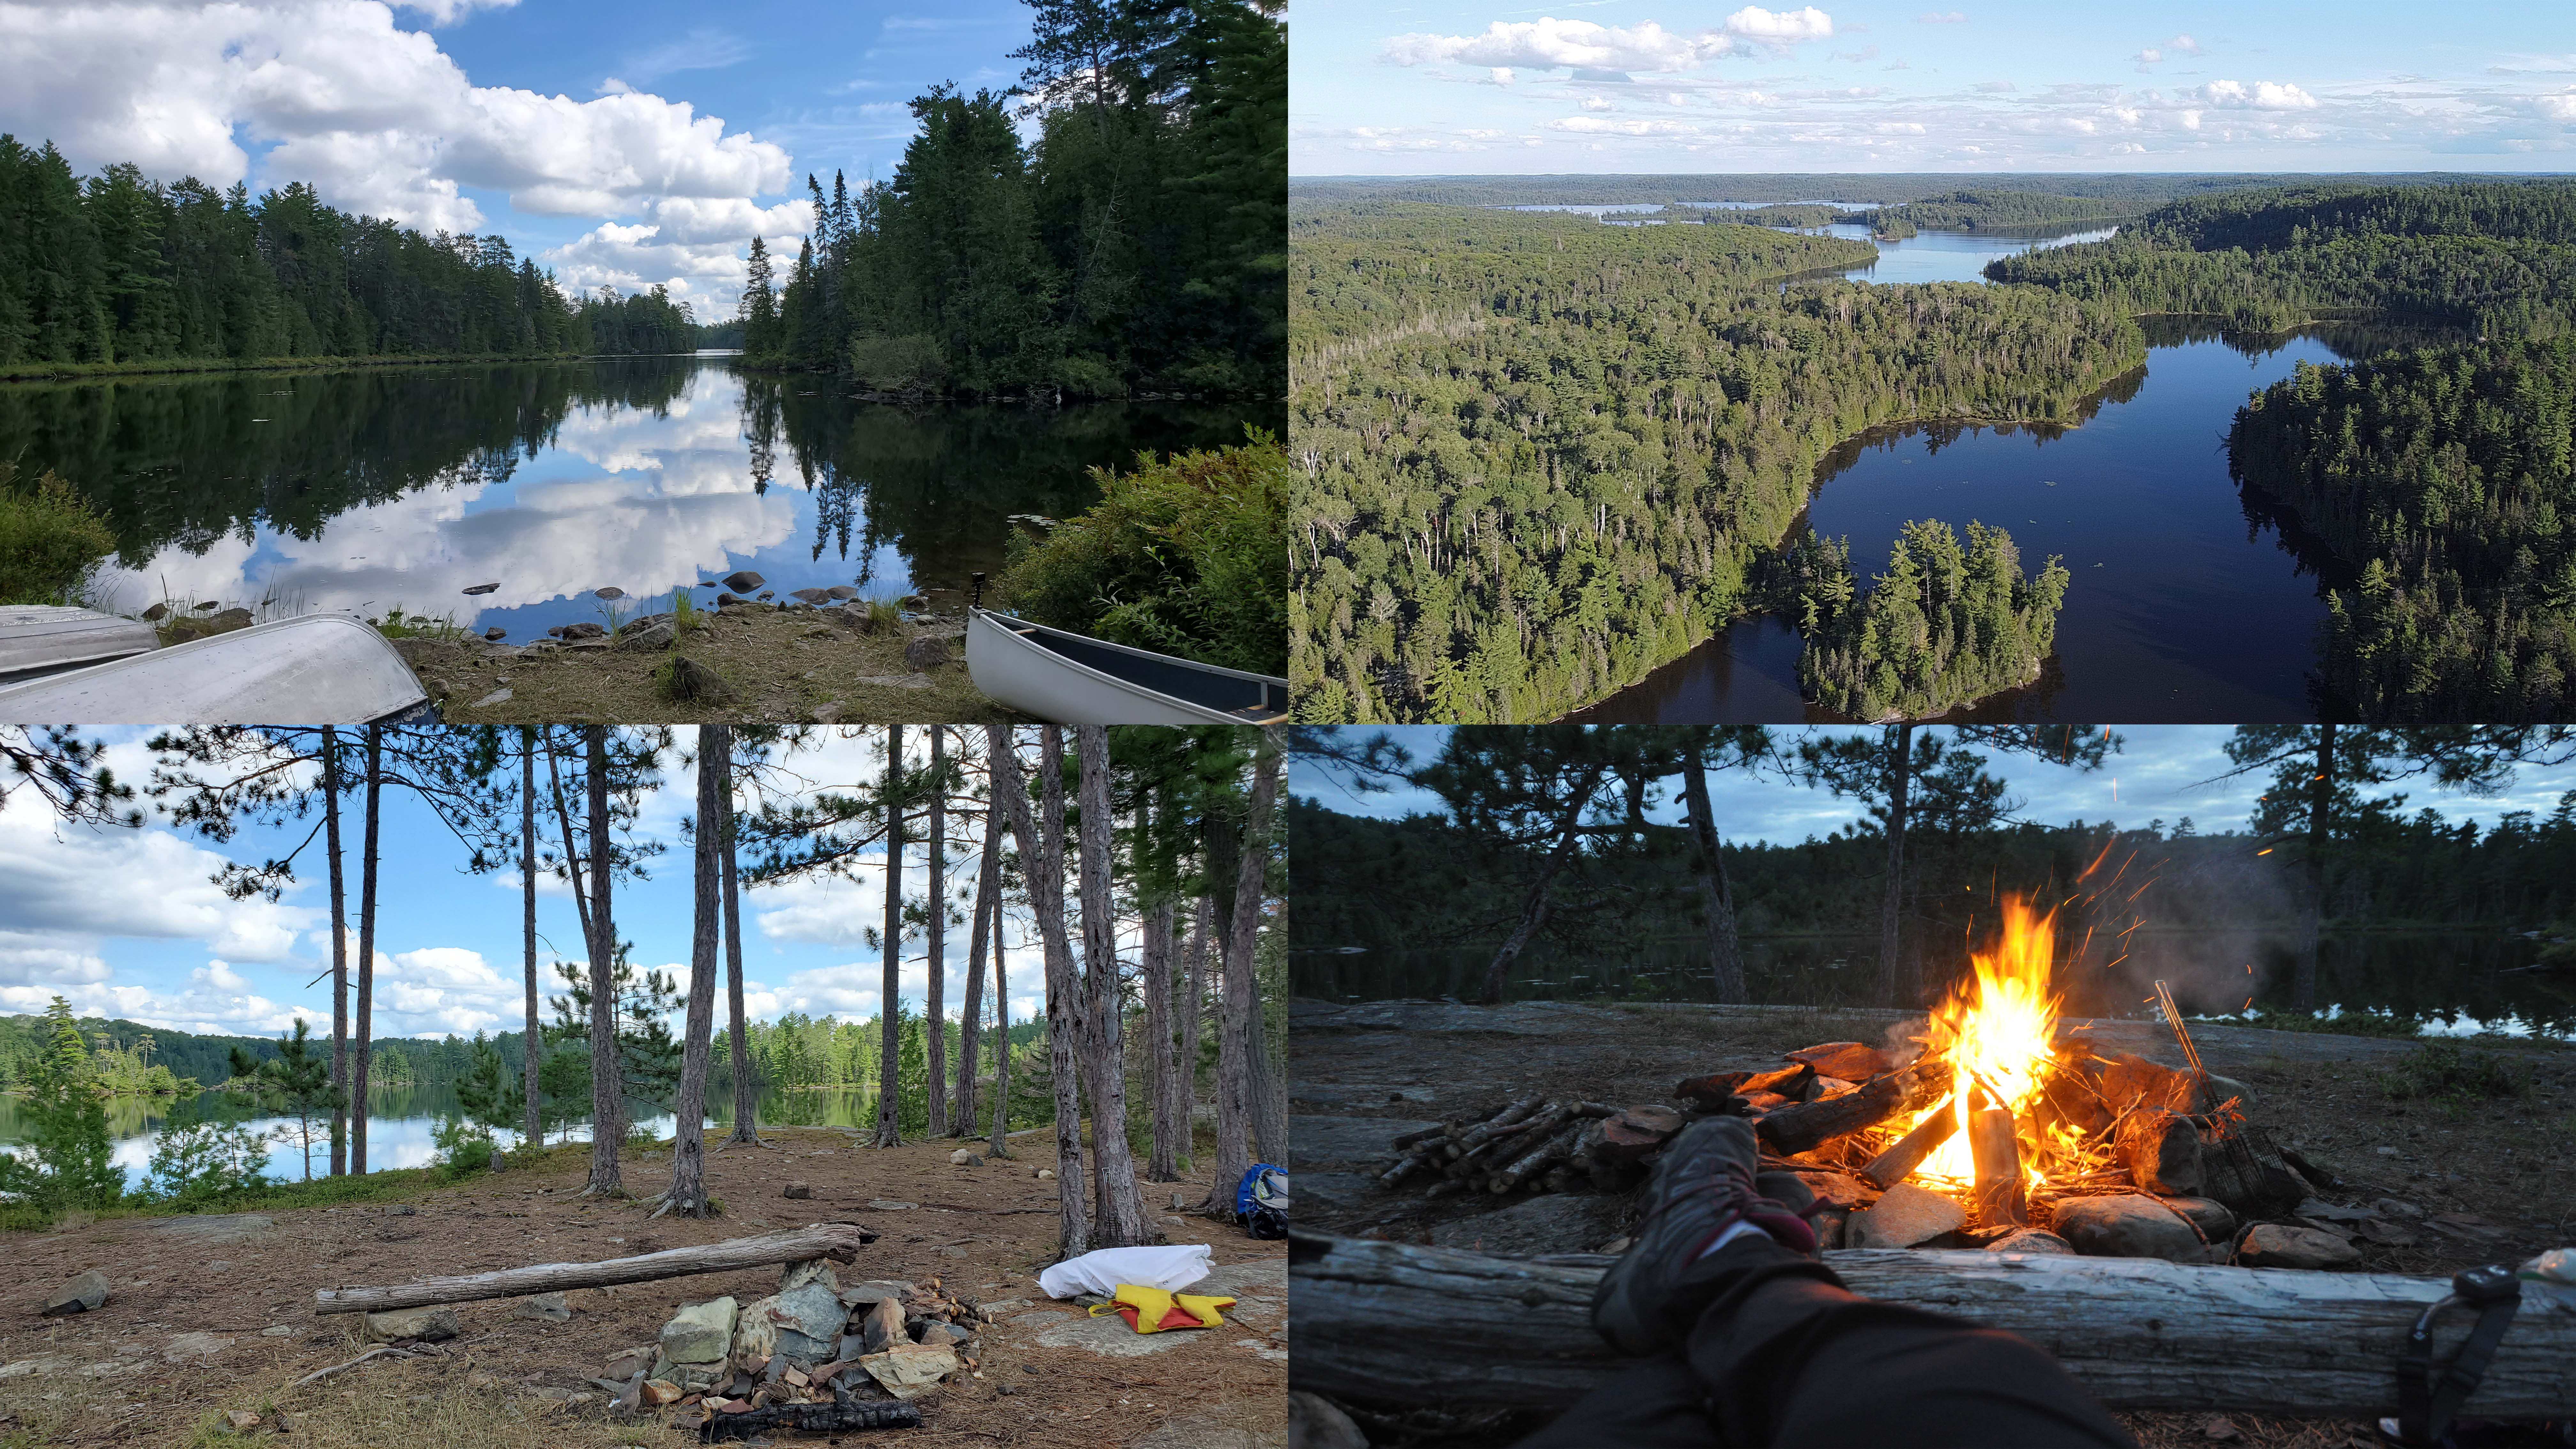 Denedus Lake